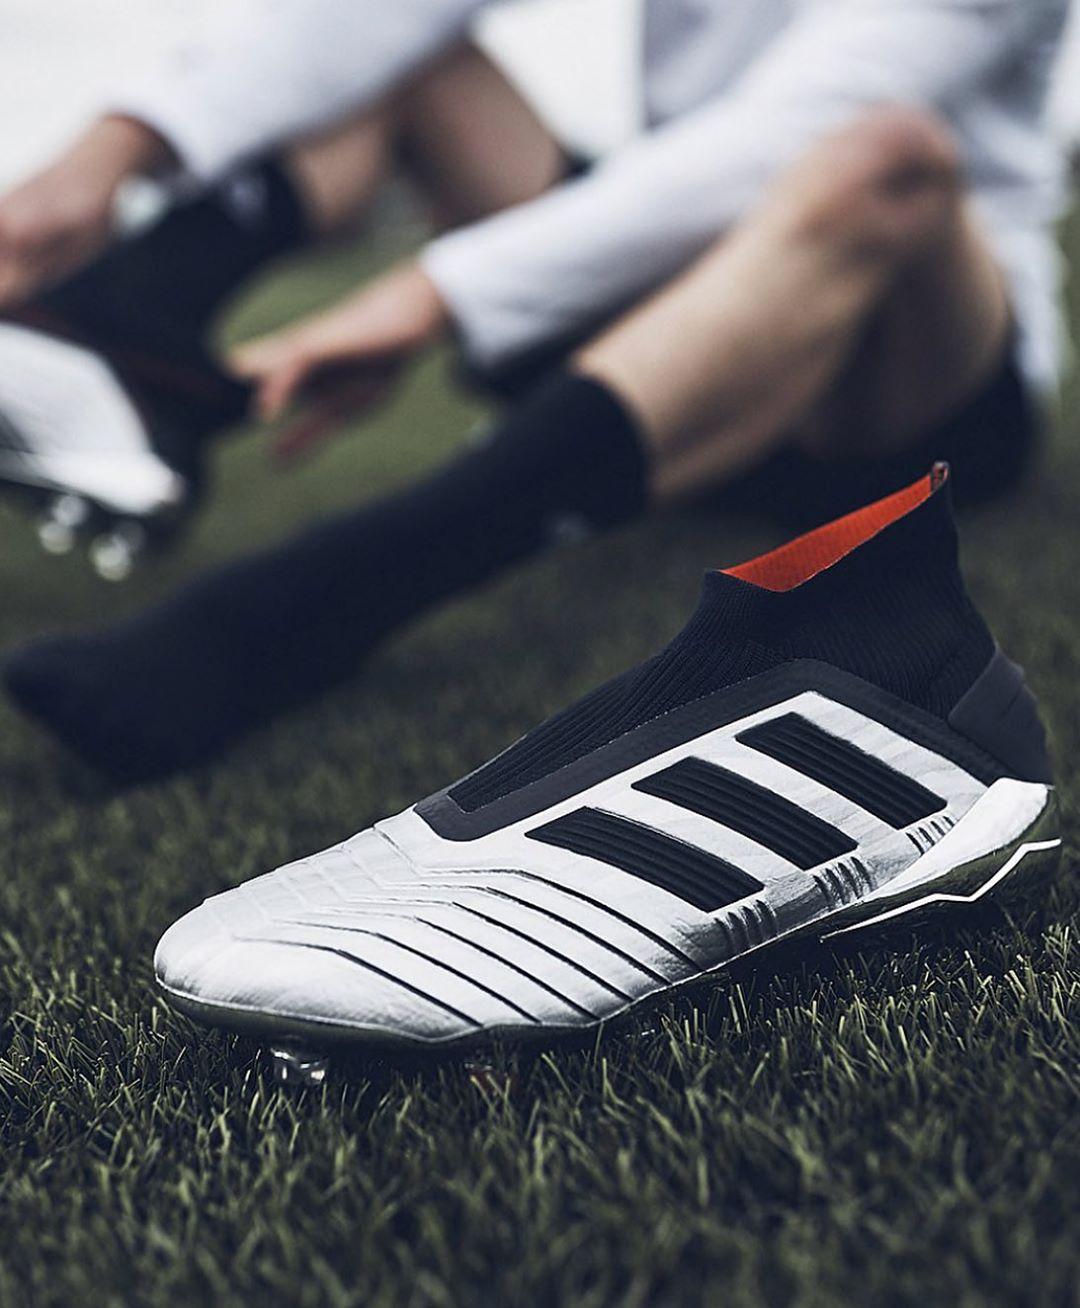 Adidas Predator ใหม่ 19+ Fg รับของคุณแล้วตอนนี้ 07894702853 # adidas #predator #adidas …